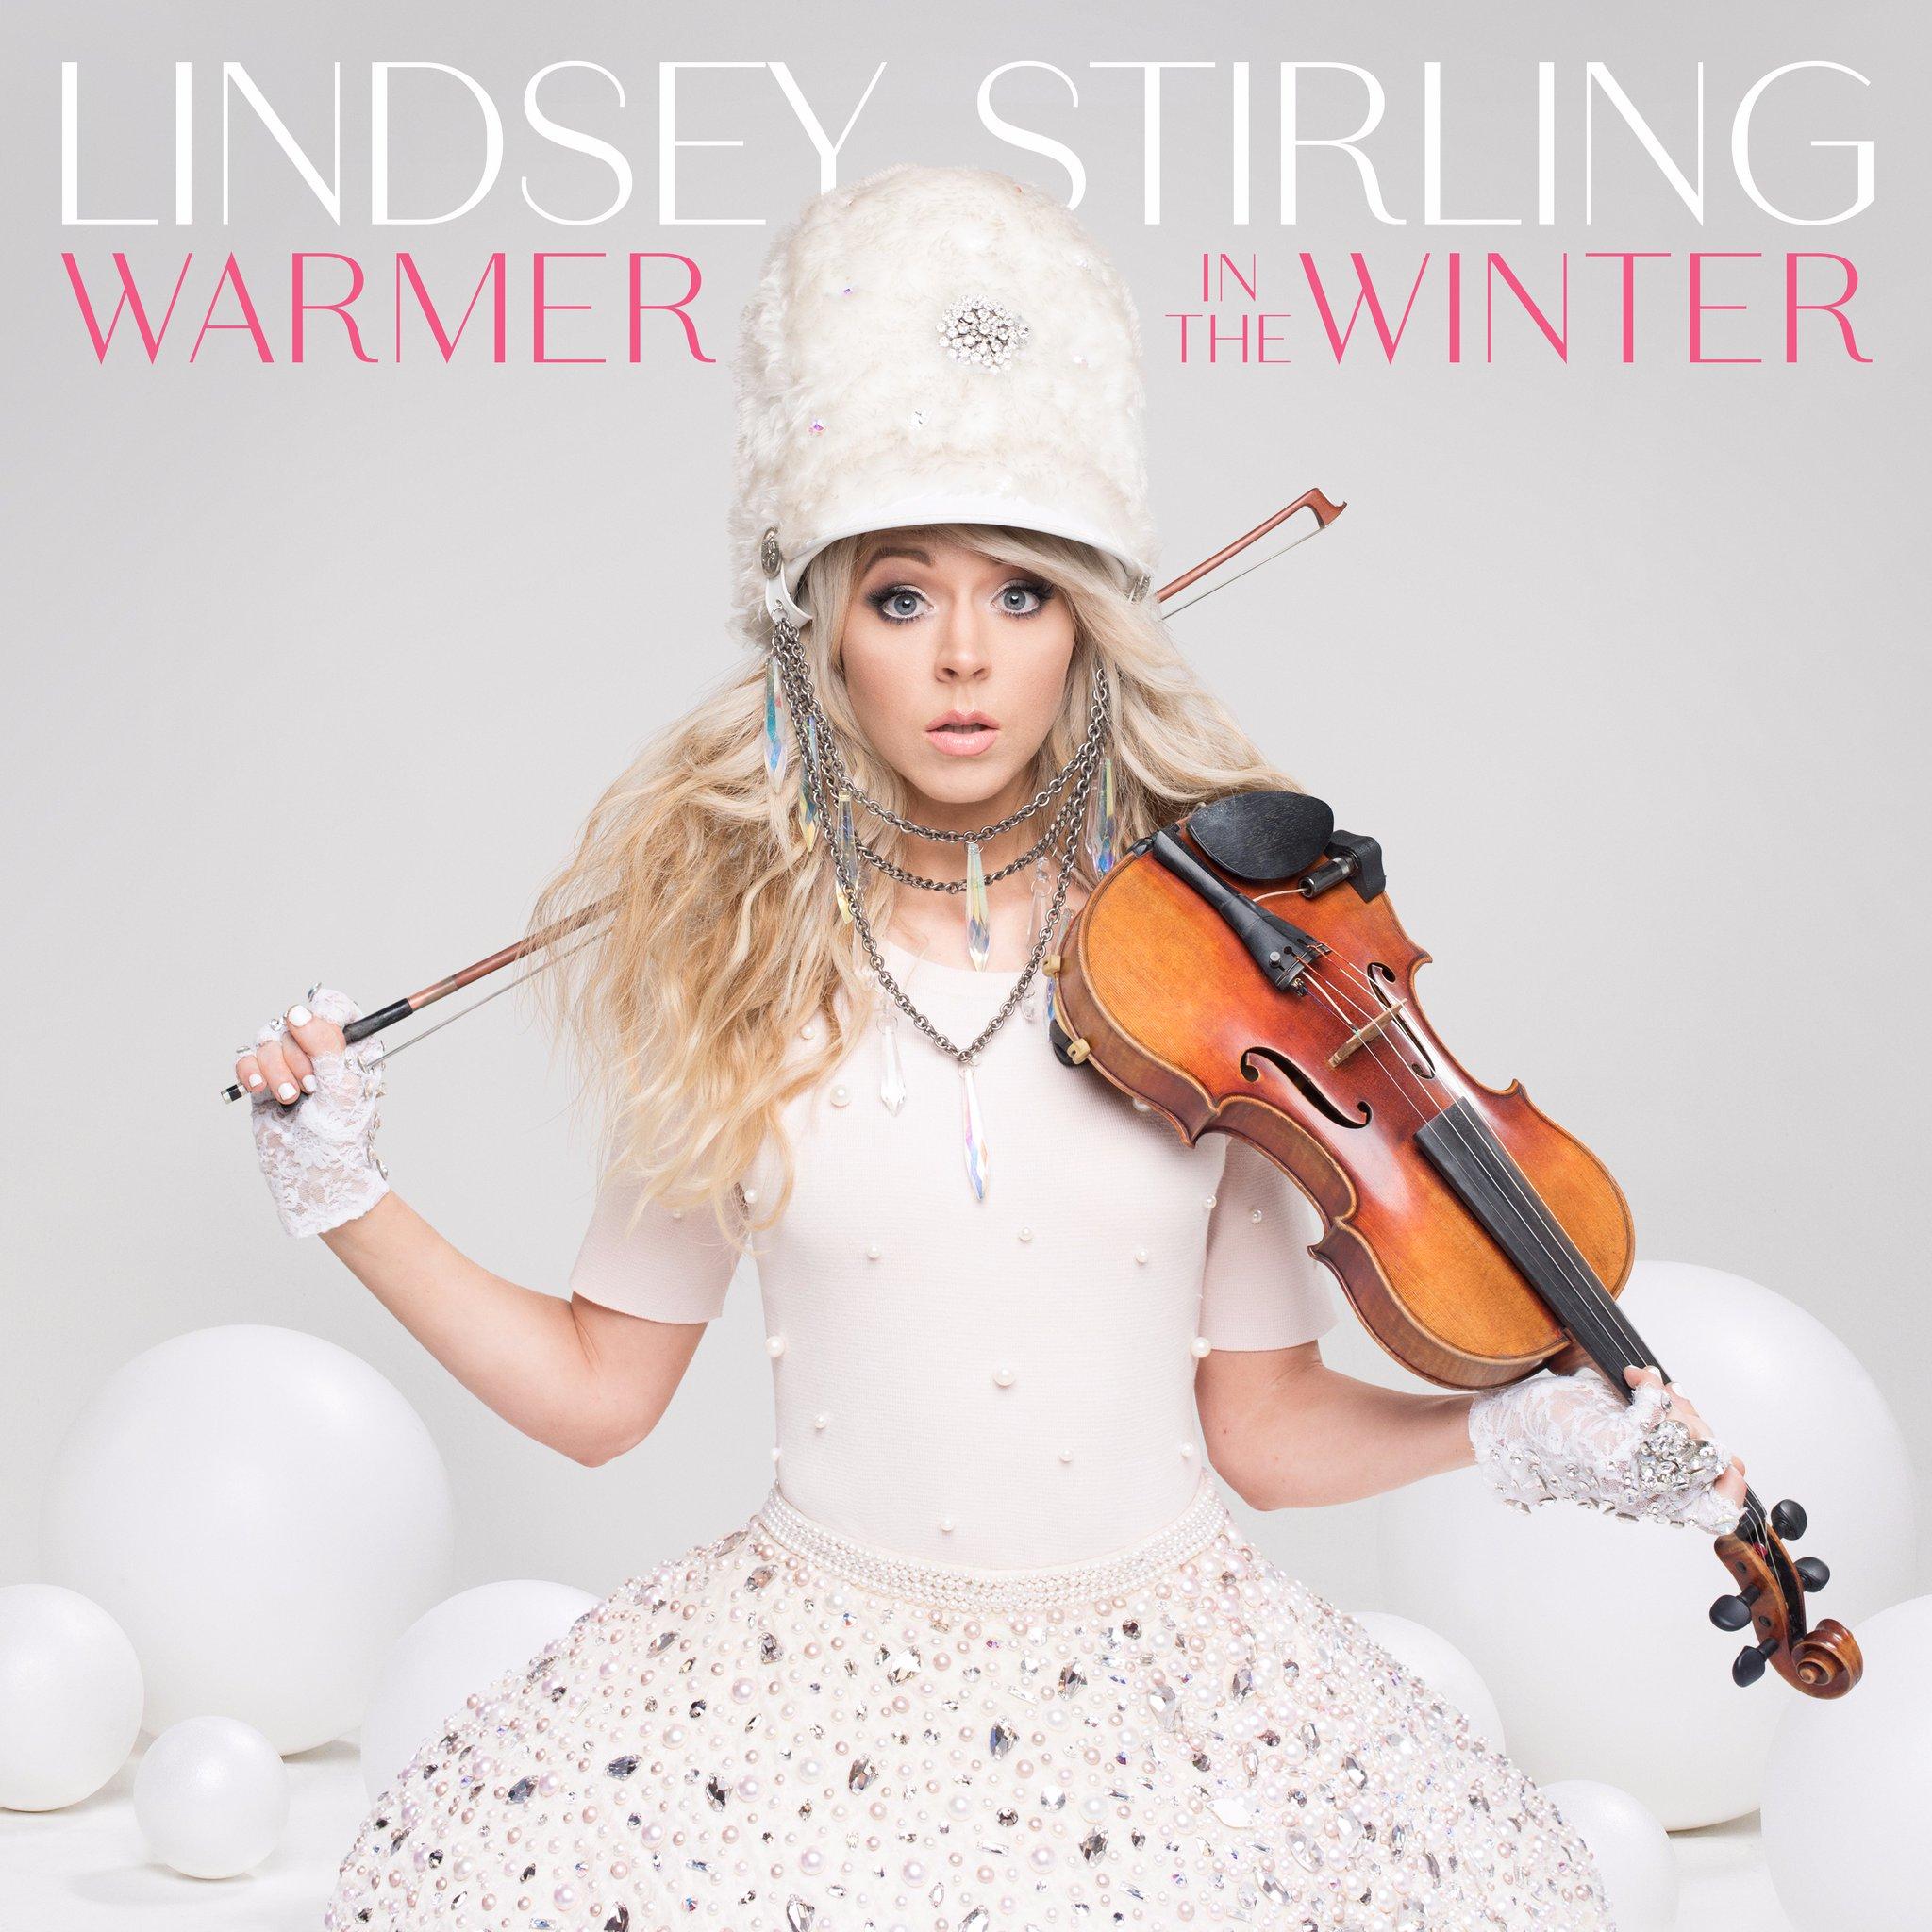 Mariah Carey Christmas Album Cover.Lindsey Stirling S Christmas Album Fails To Bring Holiday Joy